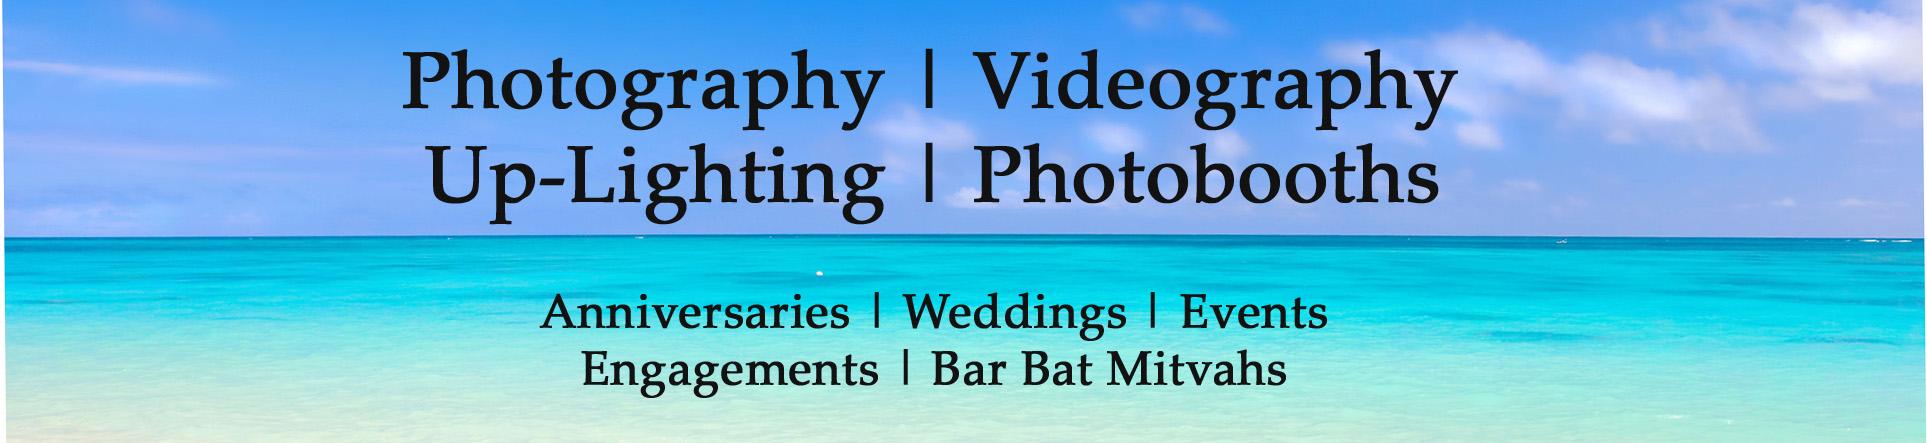 Wedding Videography Photographry Baltimore Maryland Banner